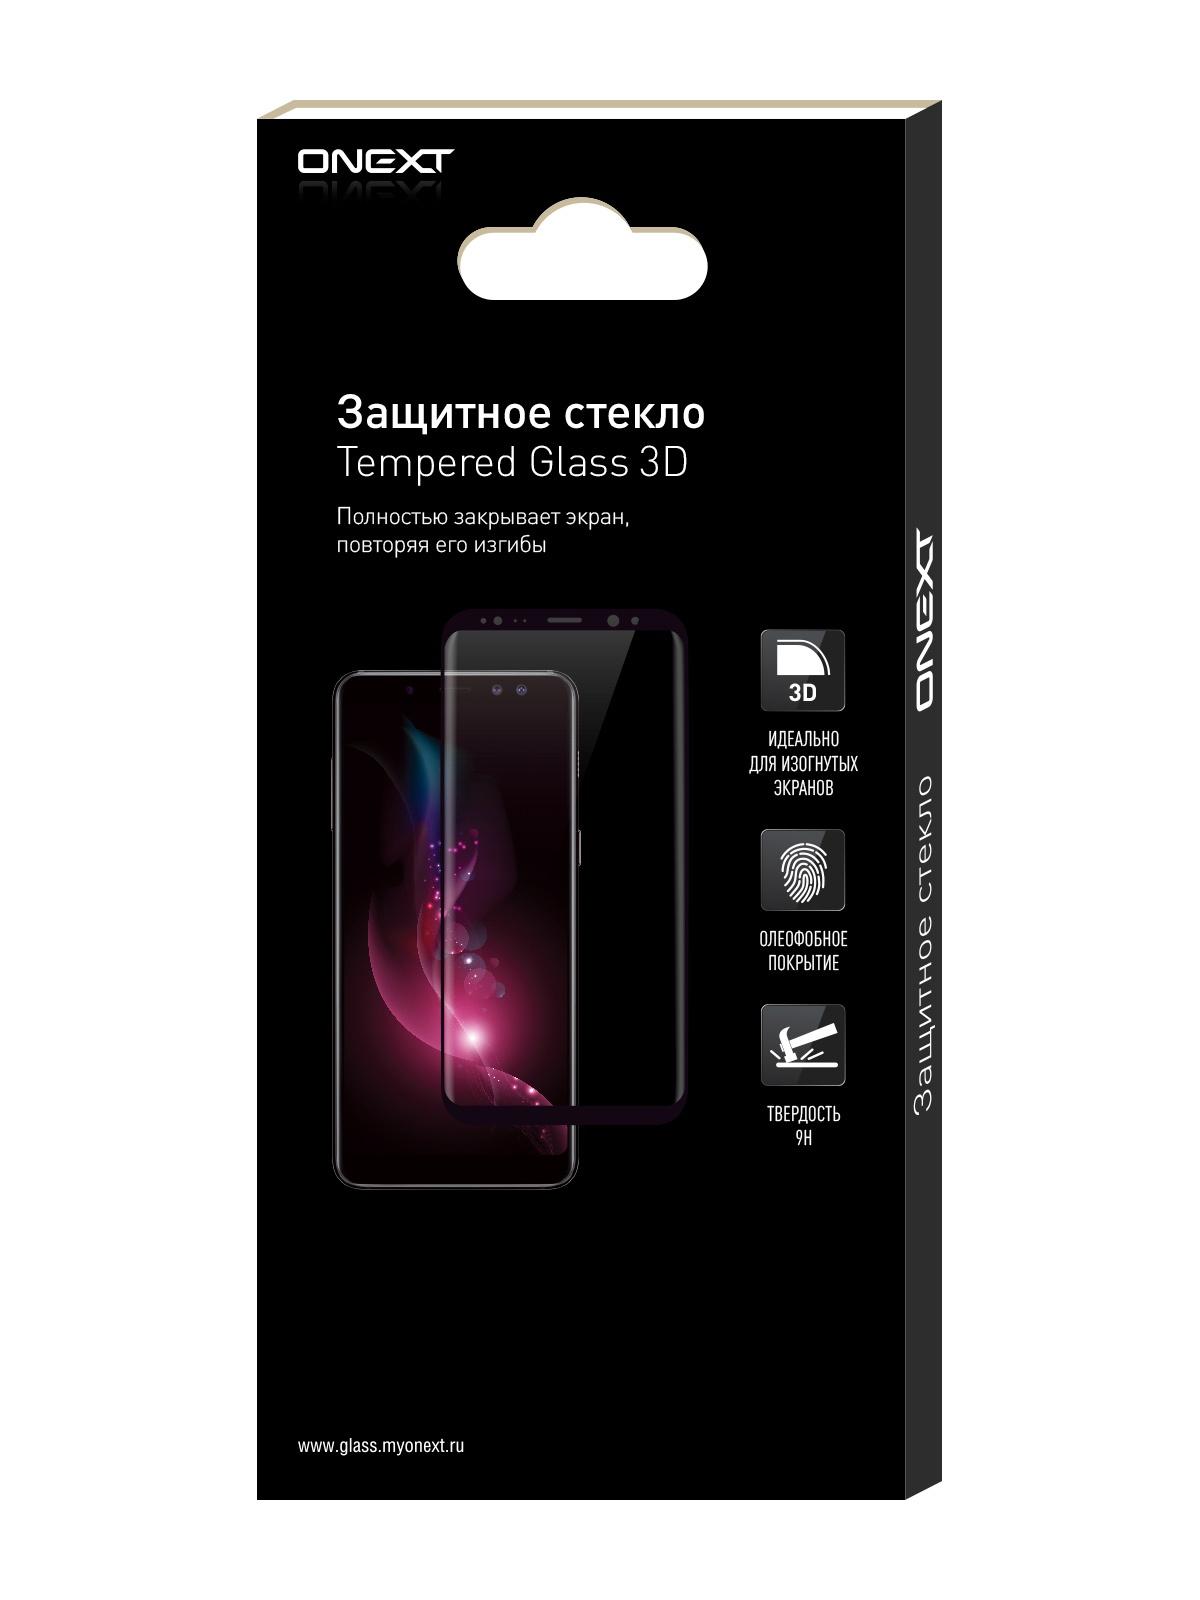 Защитное стекло ONEXT Samsung Galaxy A8 Plus 2018 3D цена и фото